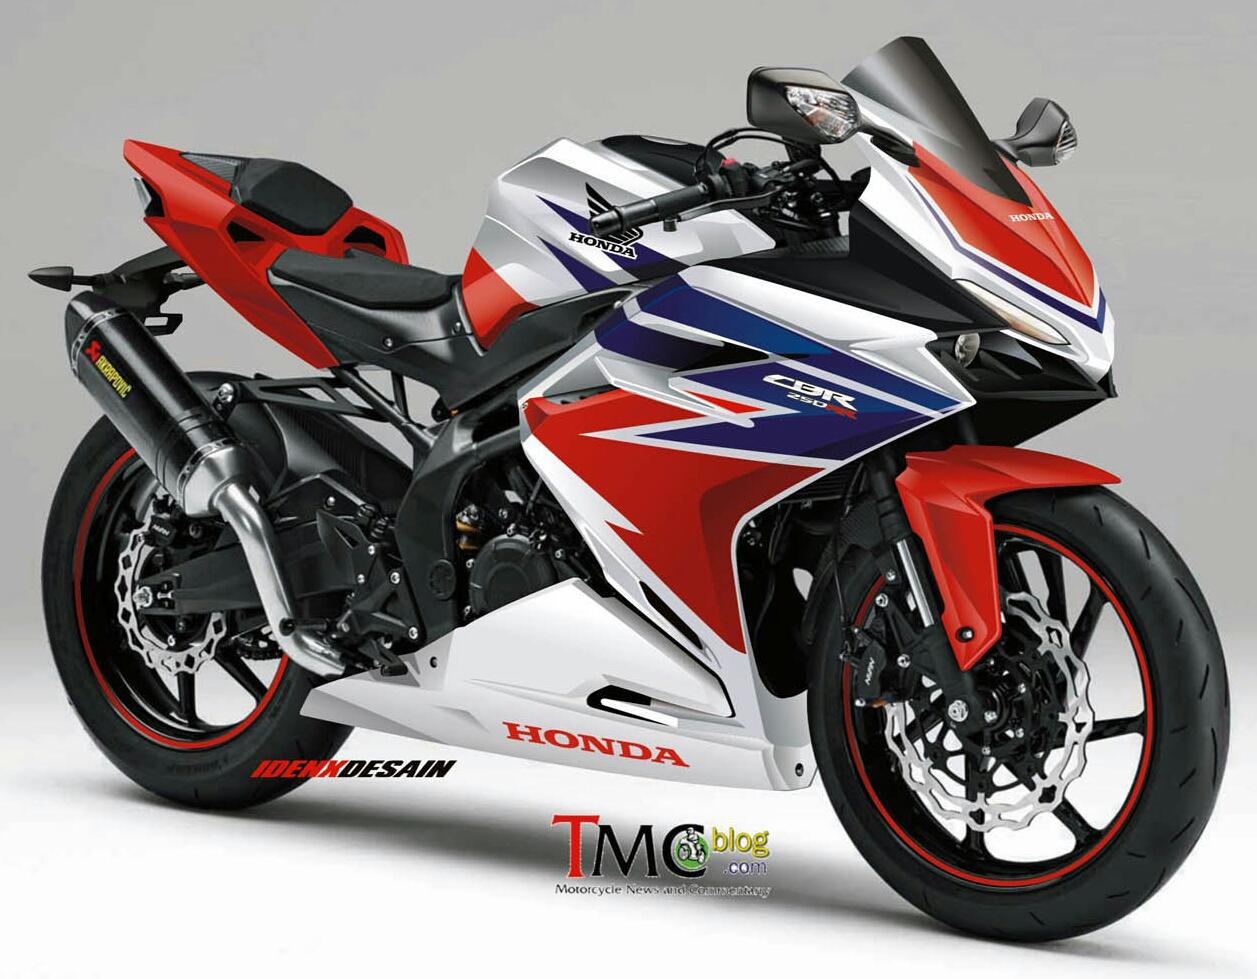 Honda cars malaysia price list 2016